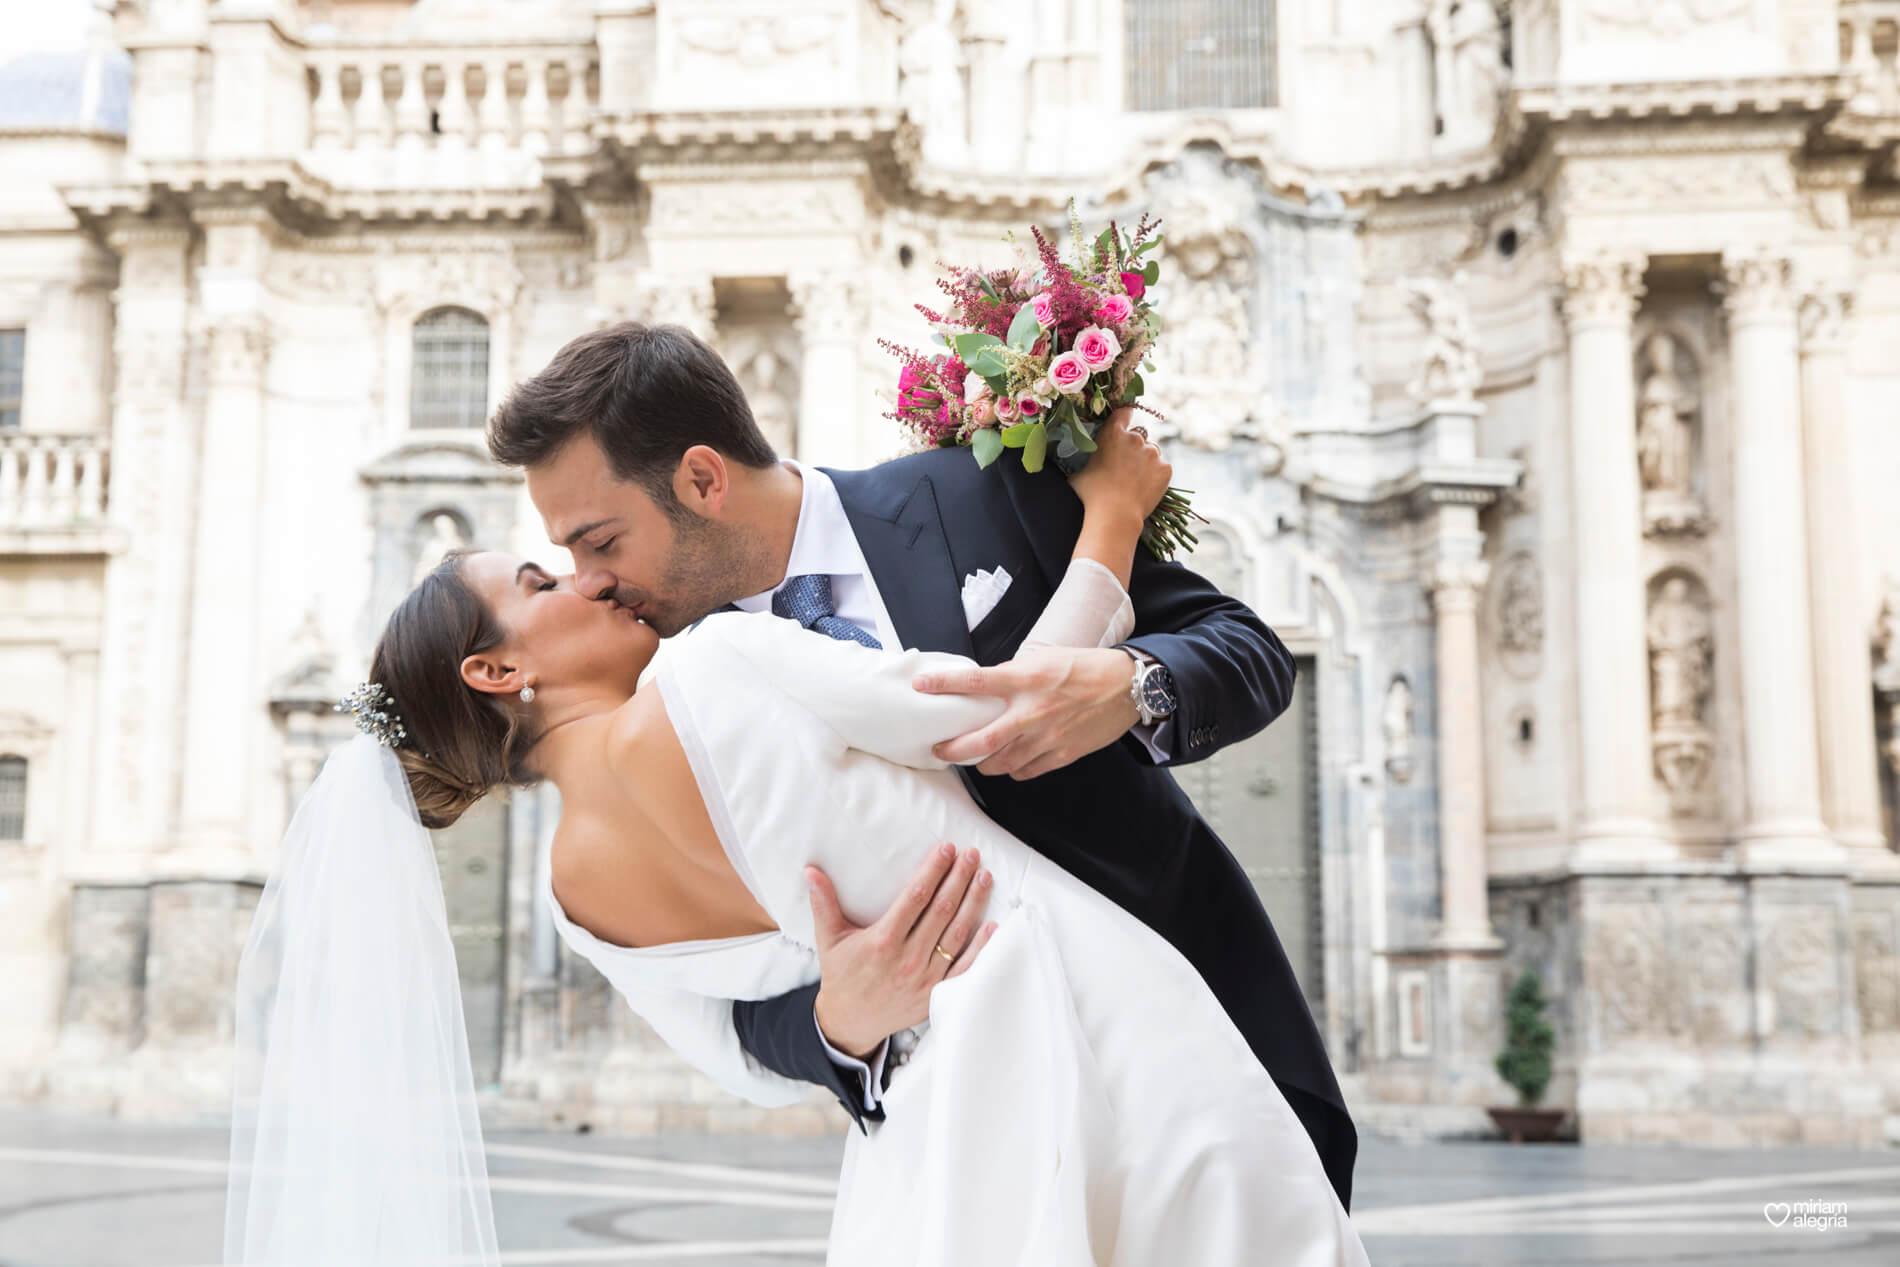 vestido-de-novia-paula-del-vas-miriam-alegria-fotografos-boda-murcia-86